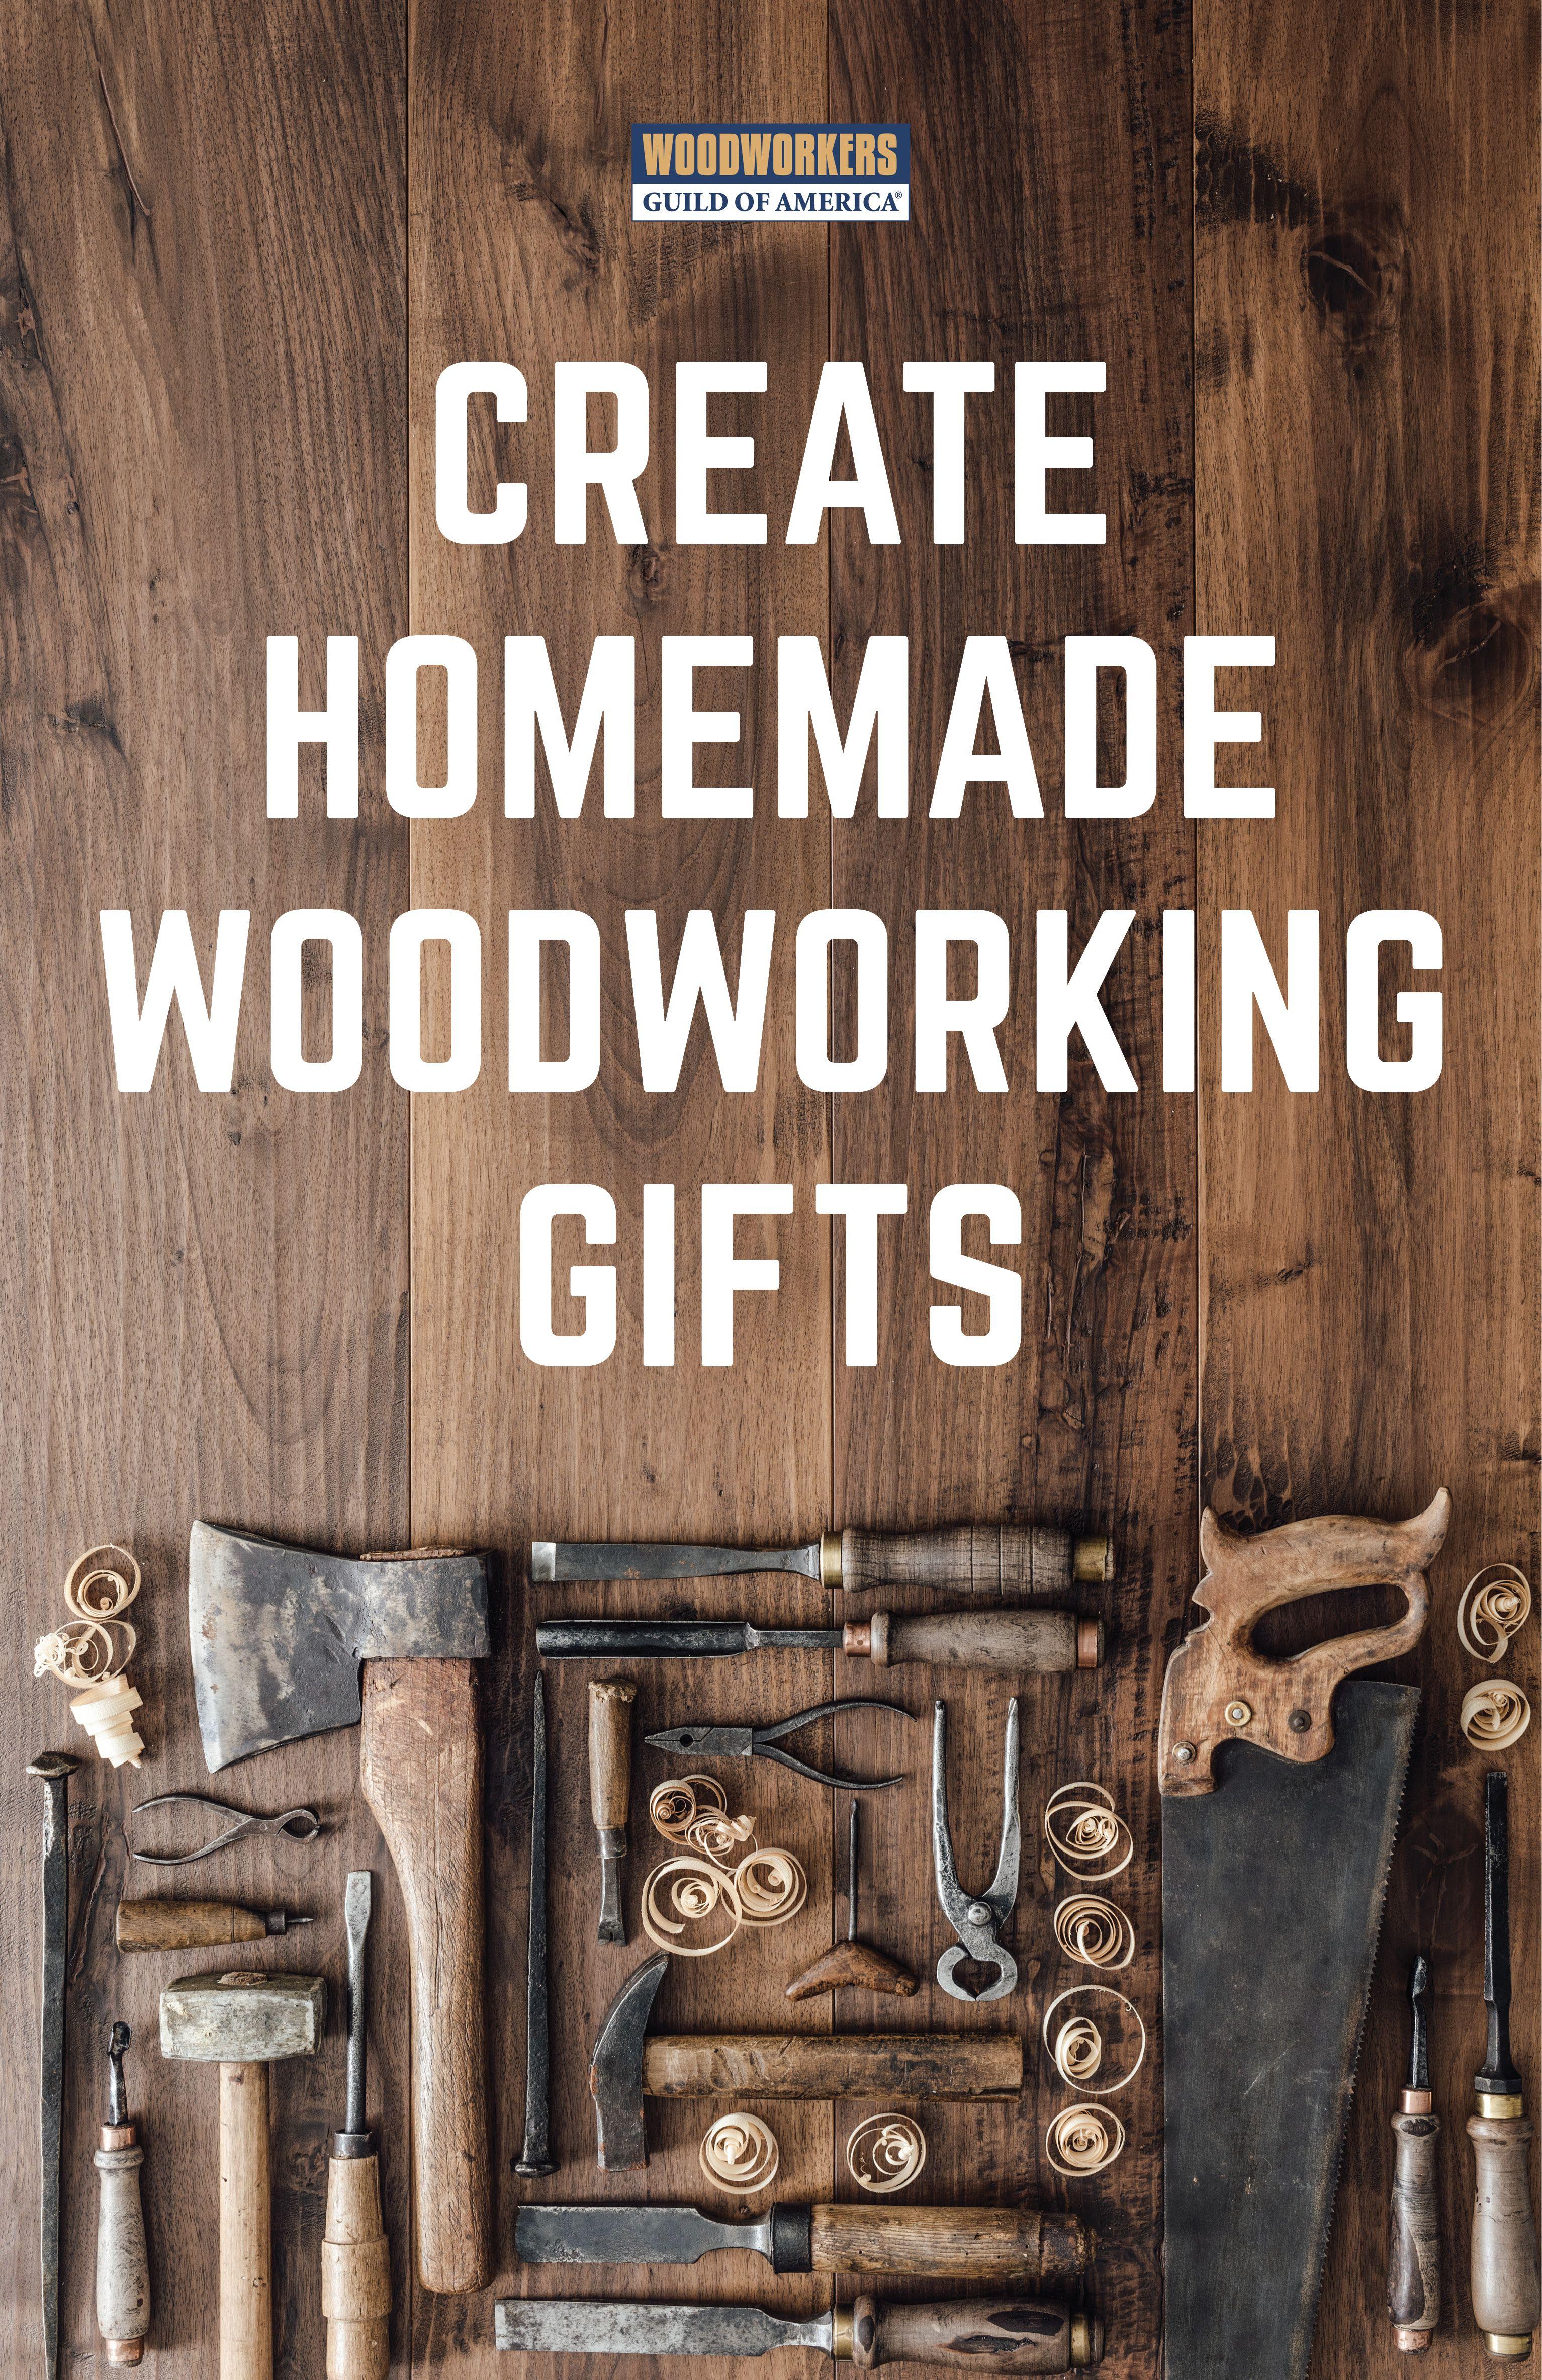 Get Expert Woodworking Videos